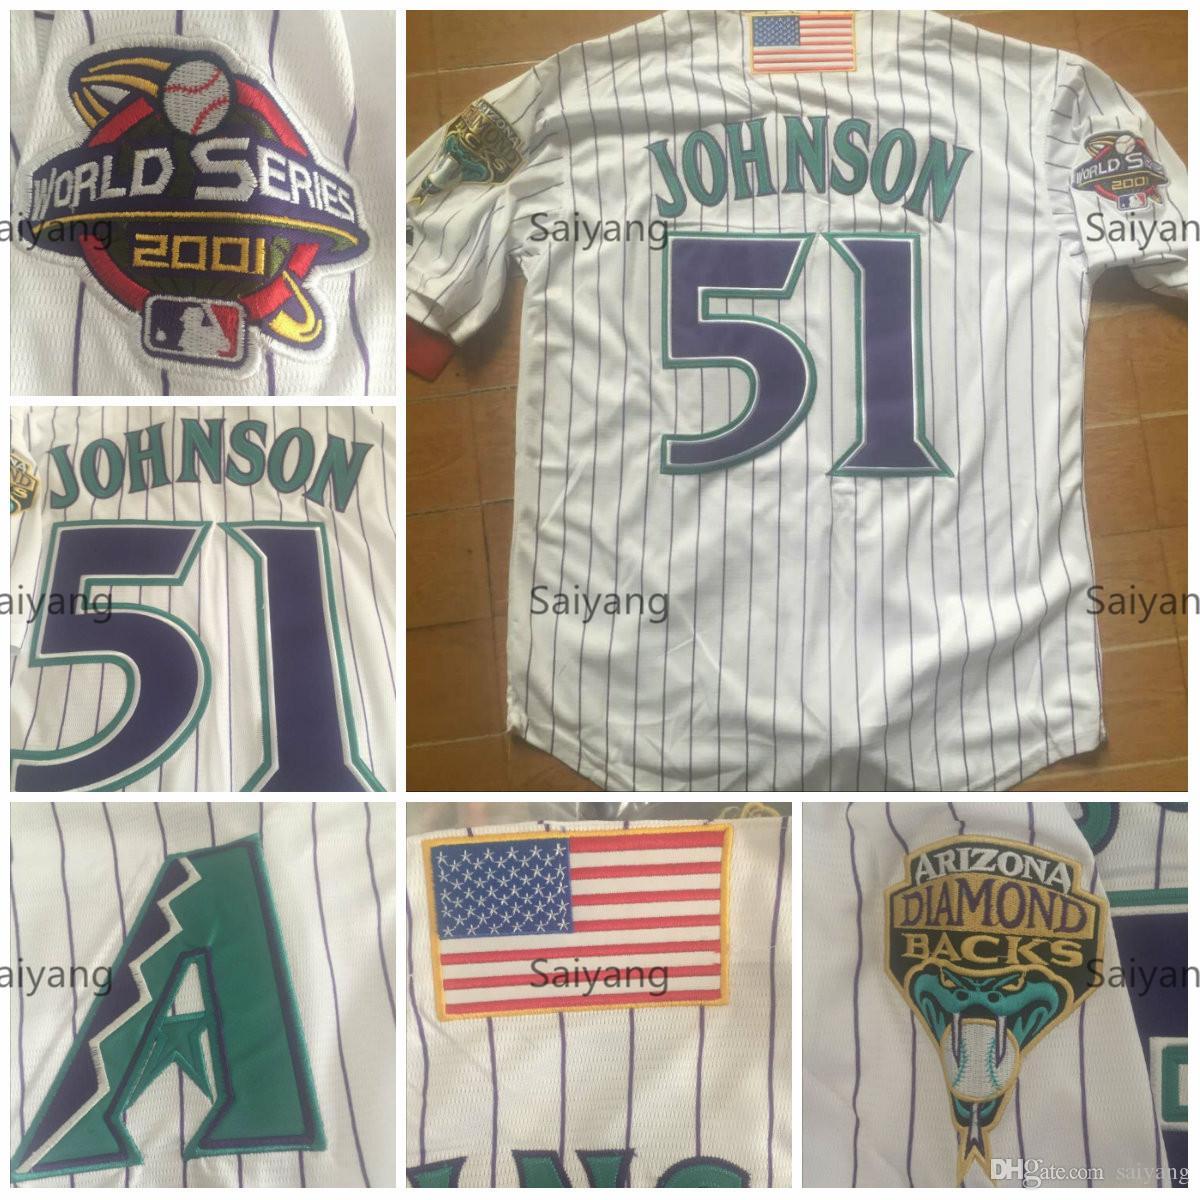 johnson jersey